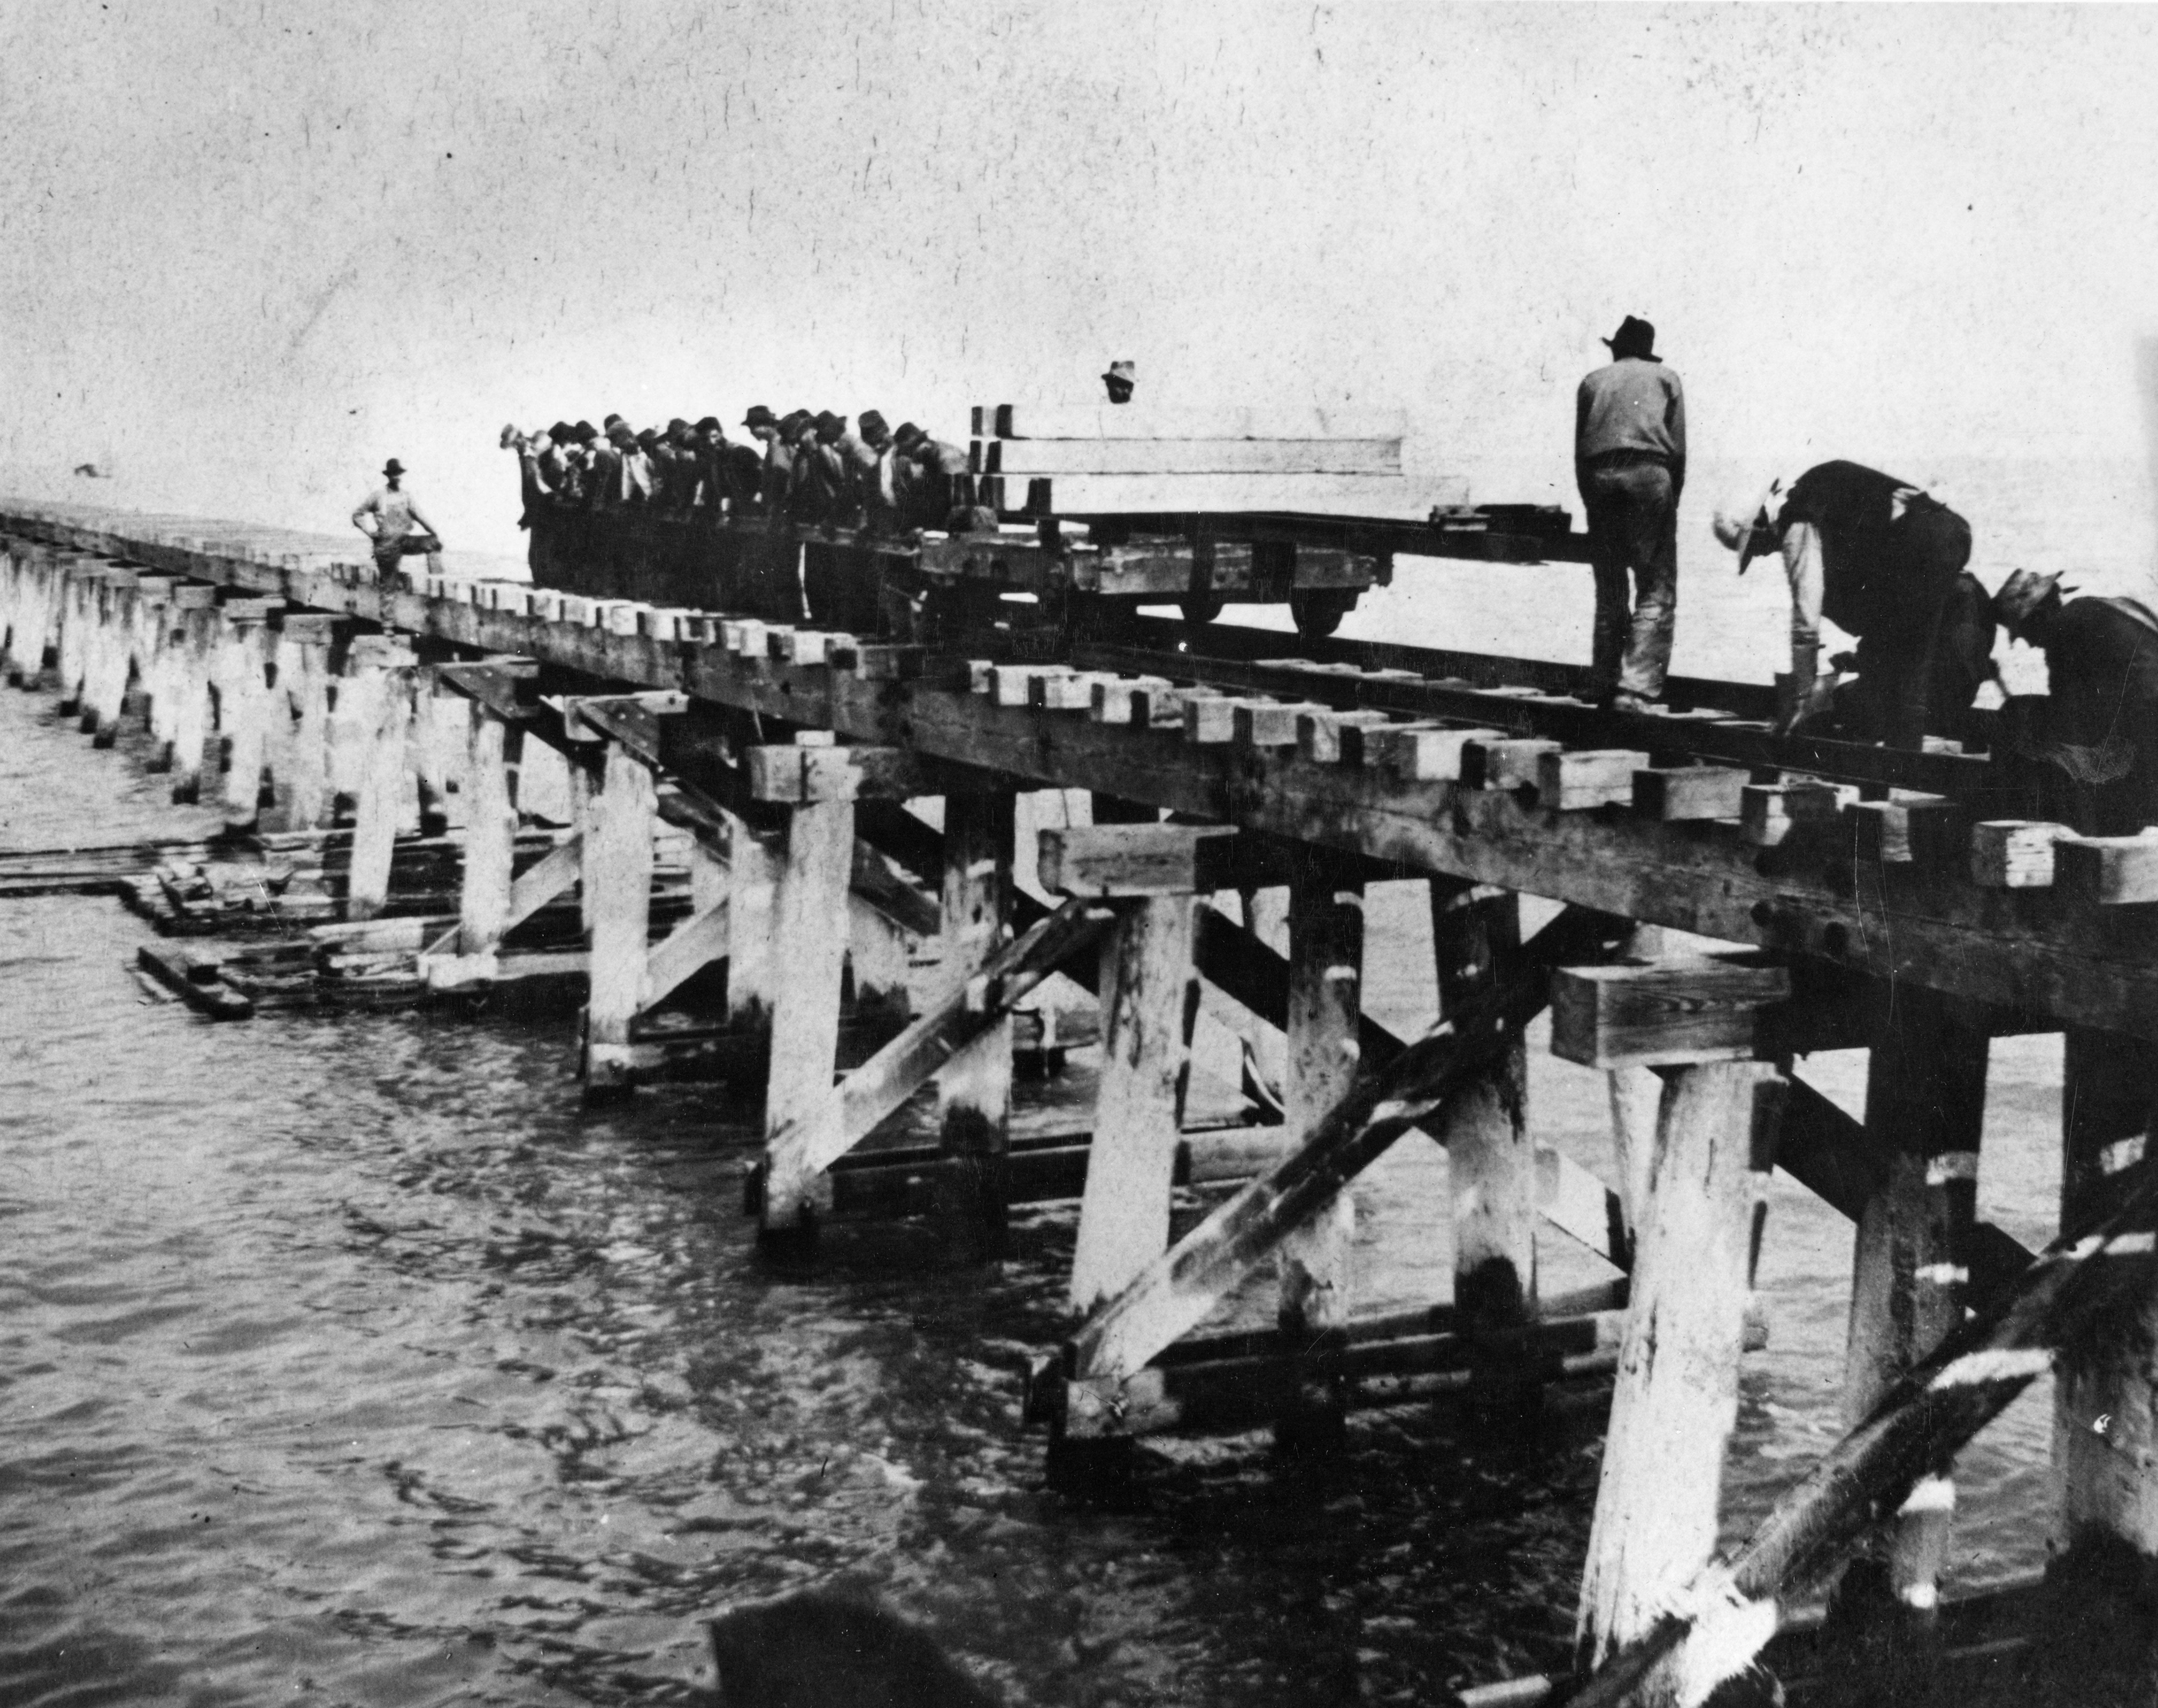 Workers build the Lucin Cutoff bridge in 1902-1903.